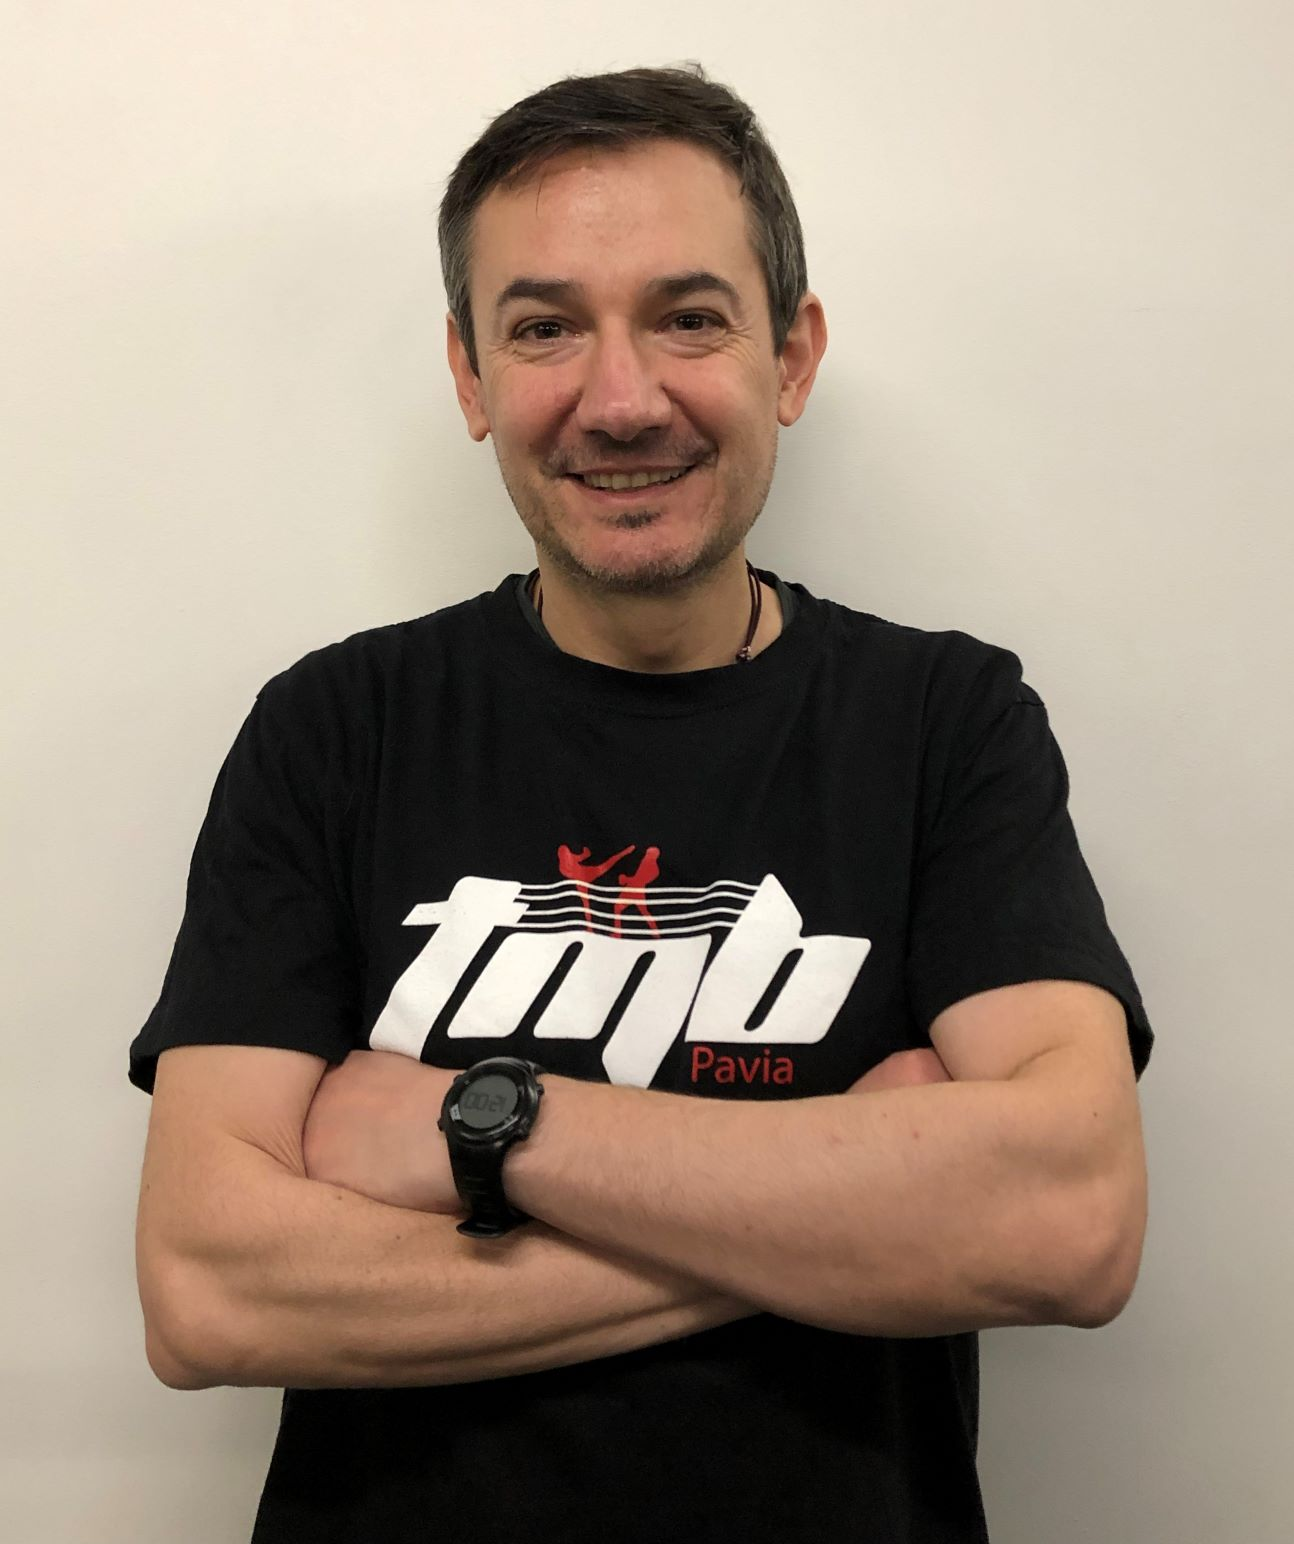 Marco Biroli Maestro Savate TMB Pavia